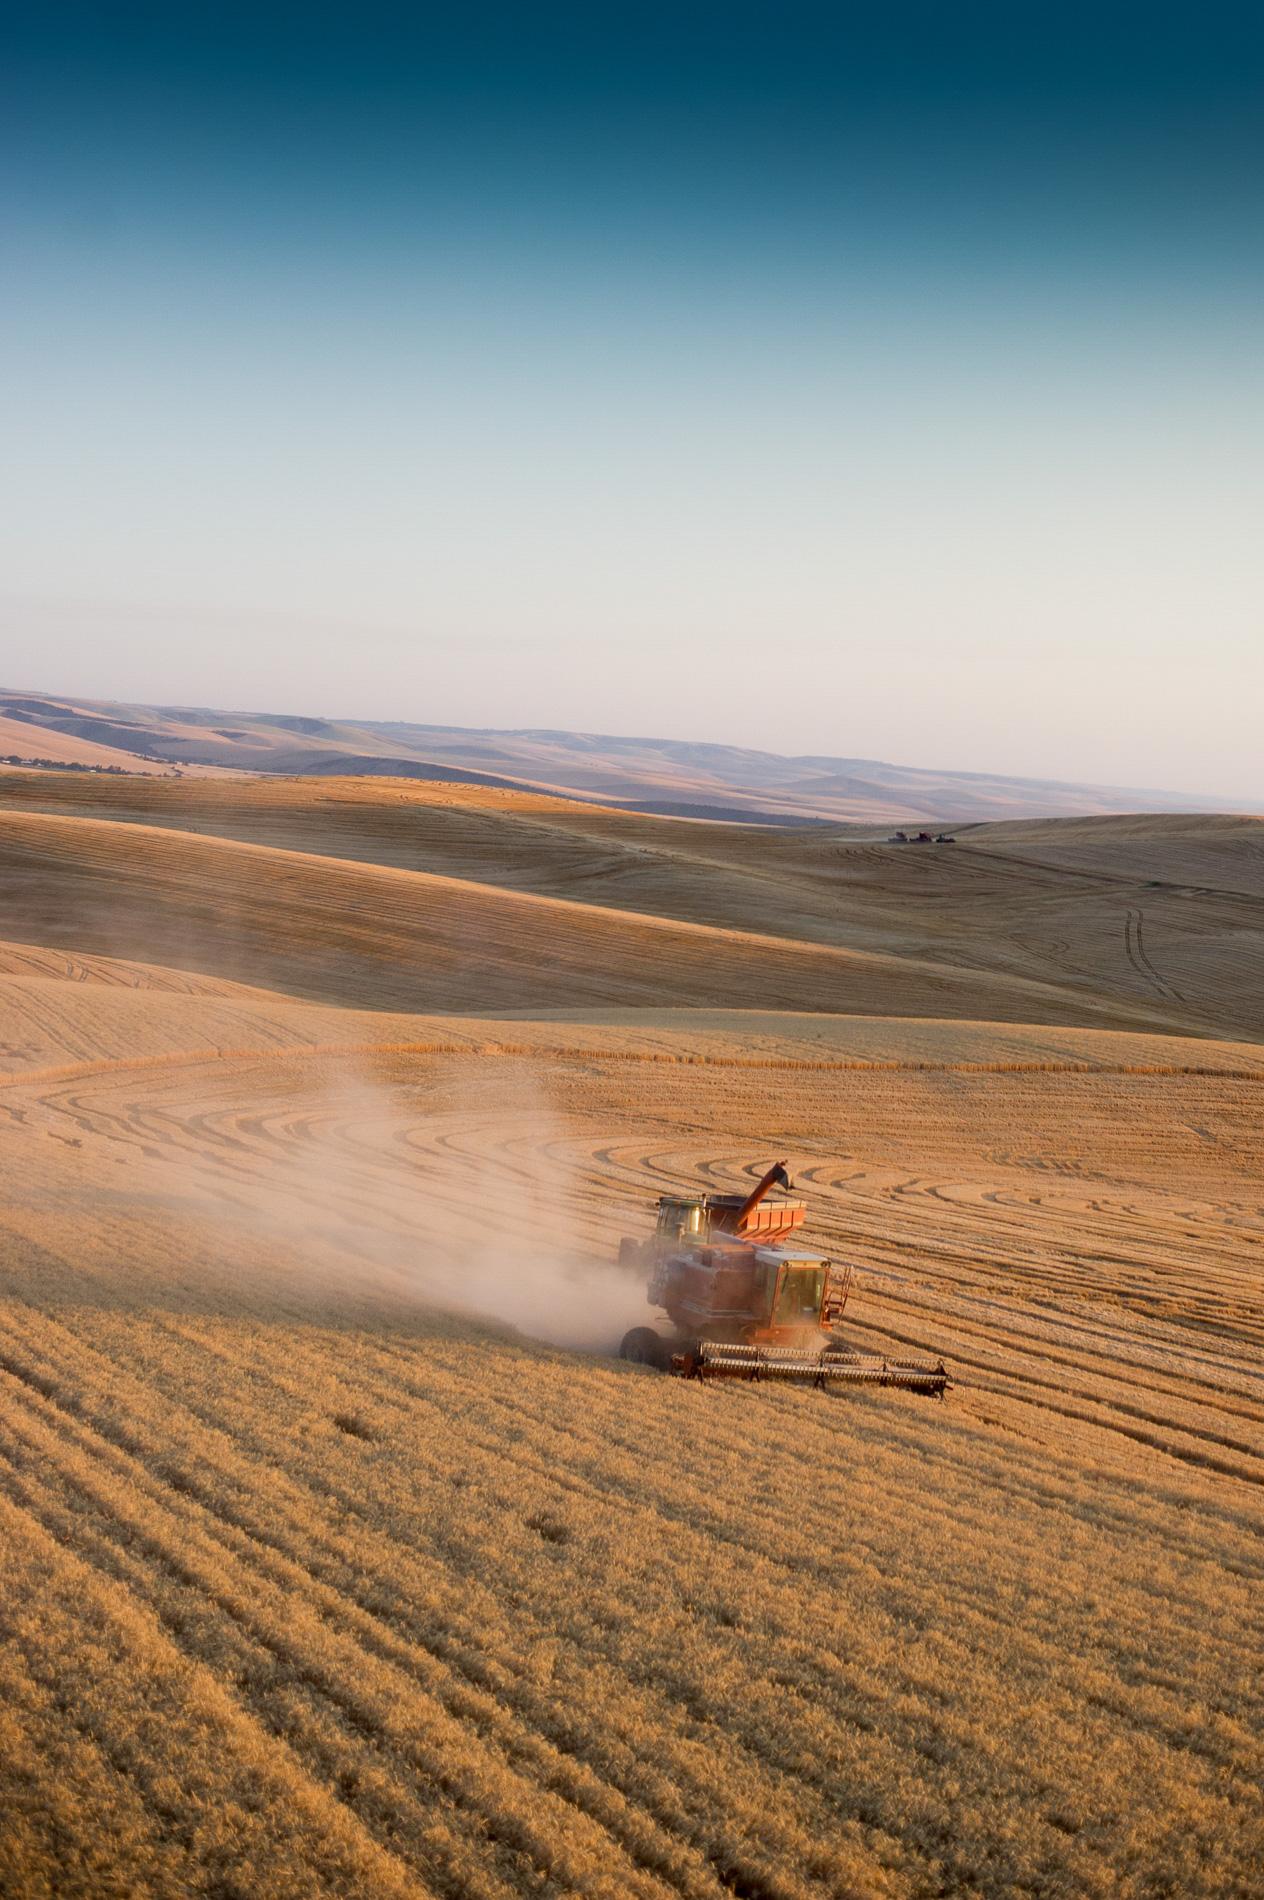 Wheat Harvest in Walla Walla